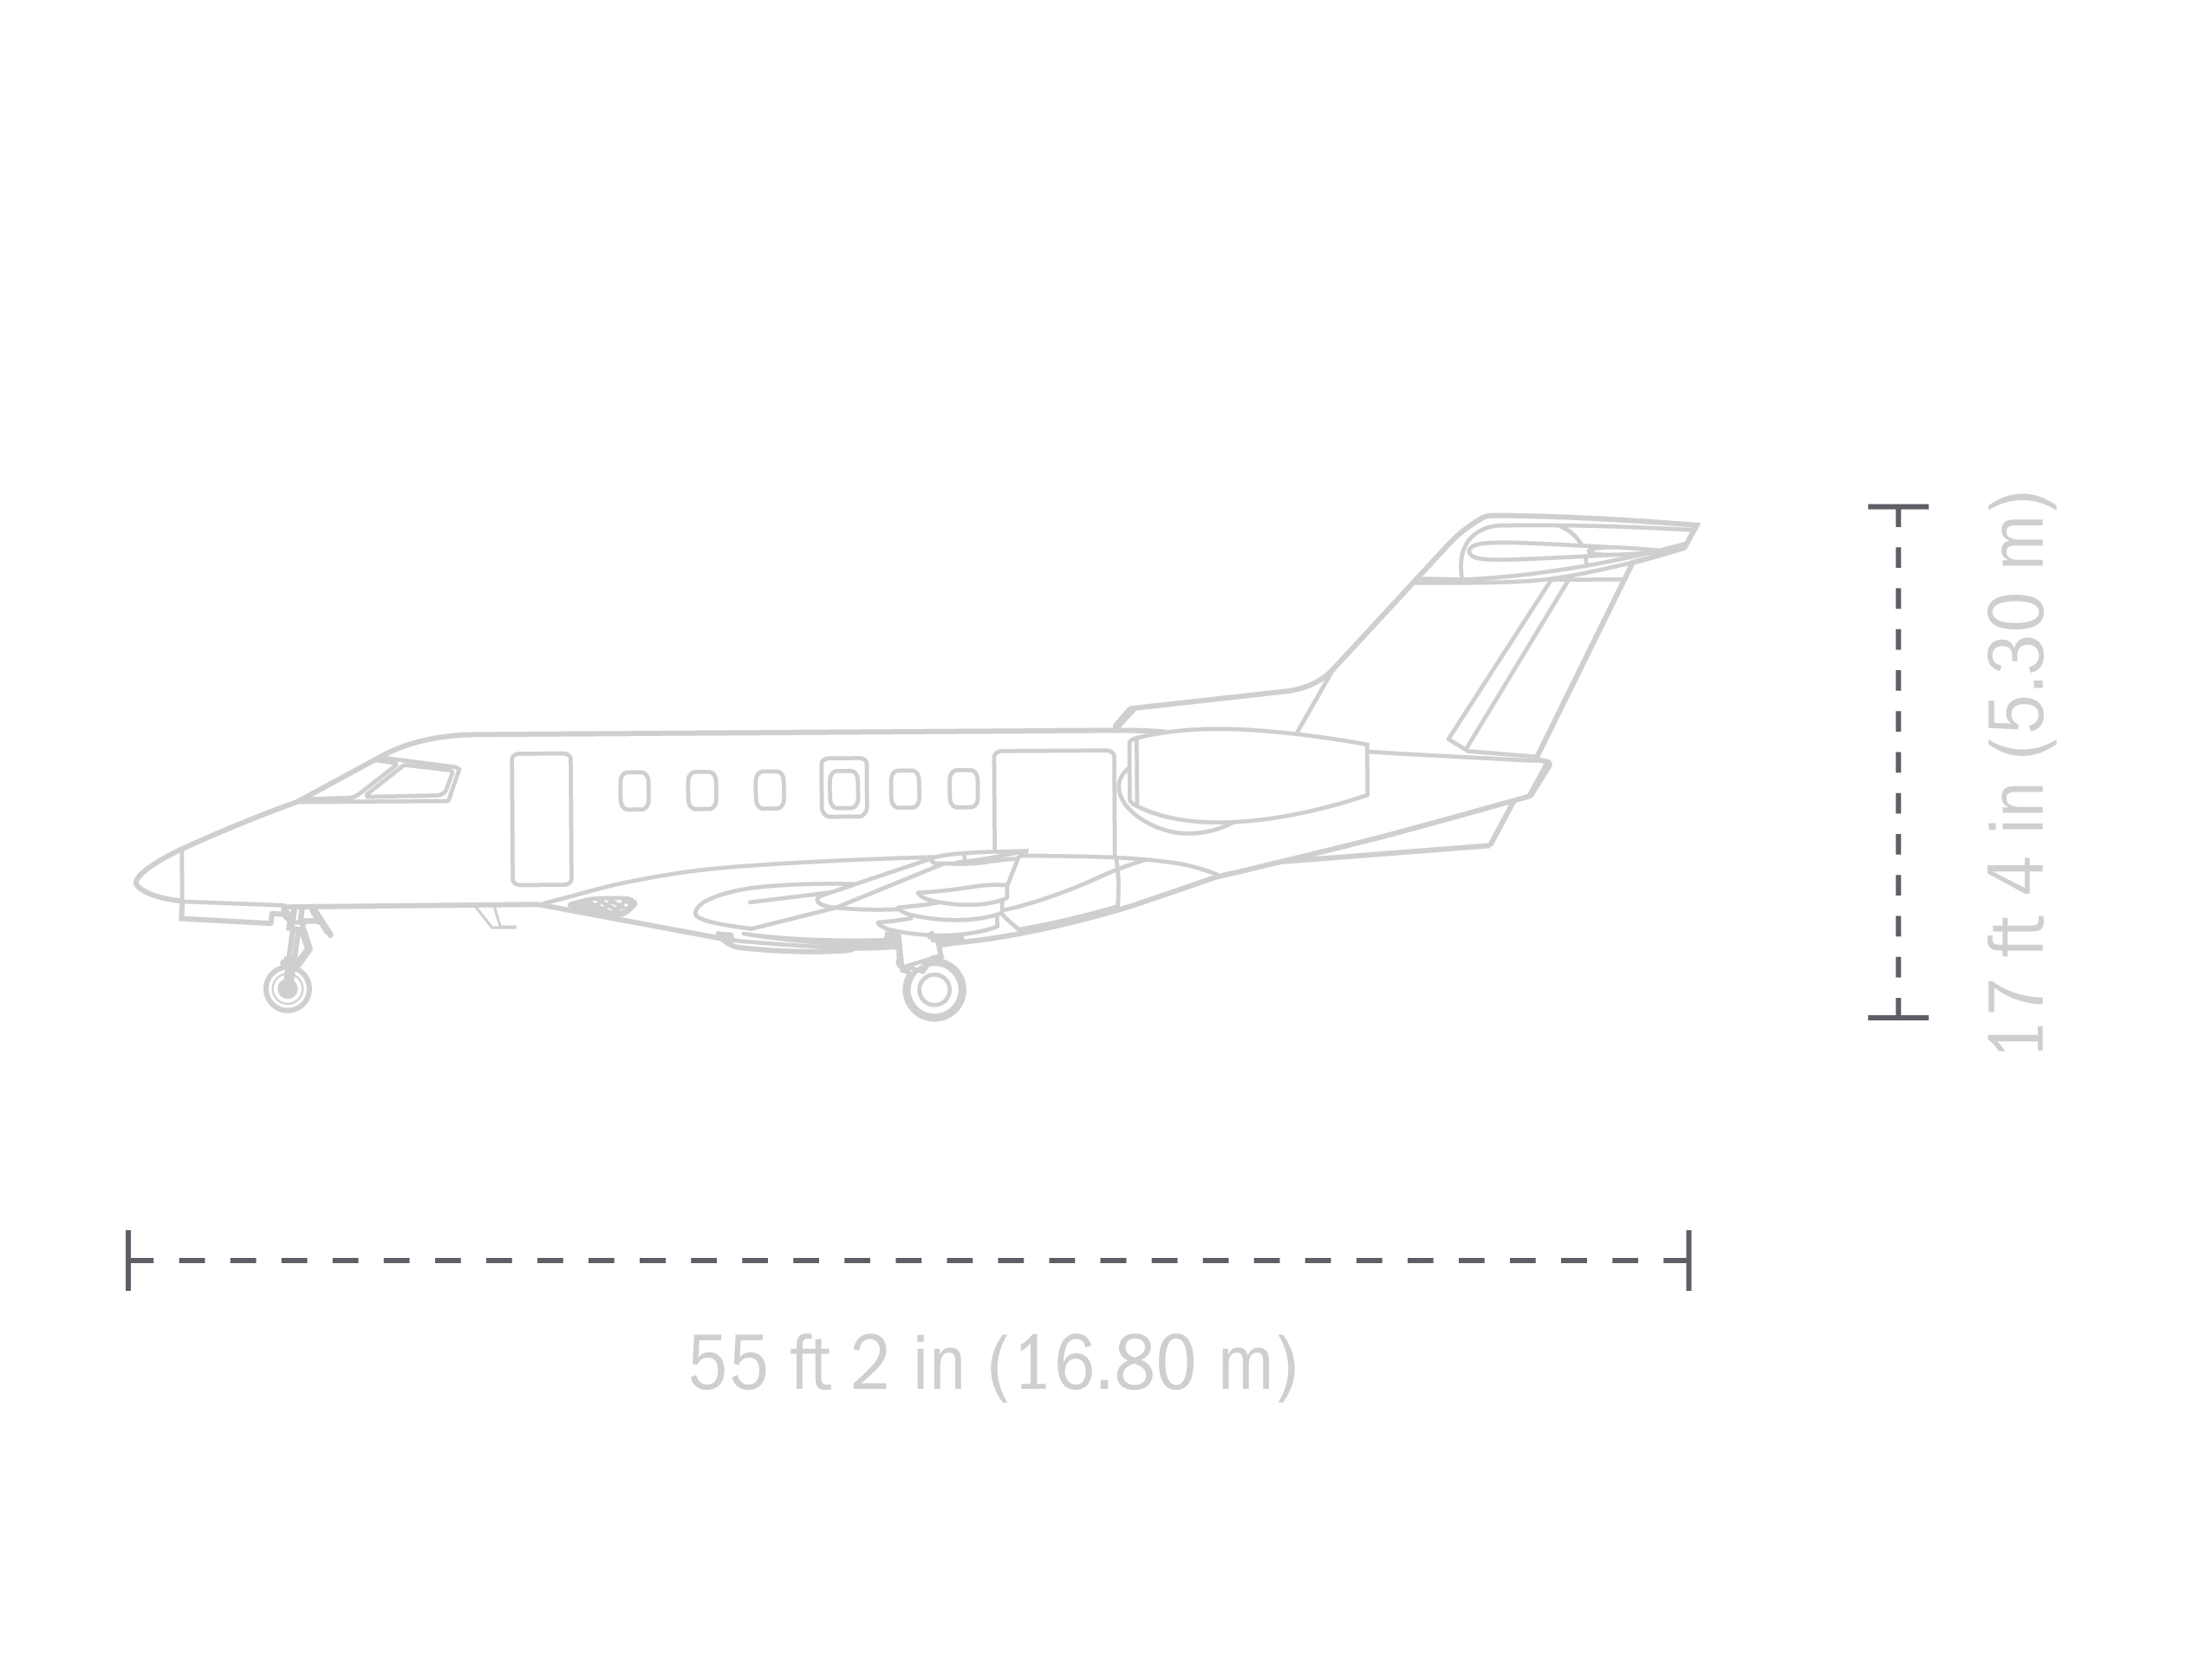 PC-24 | The Super Versatile Jet | Pilatus Aircraft Ltd